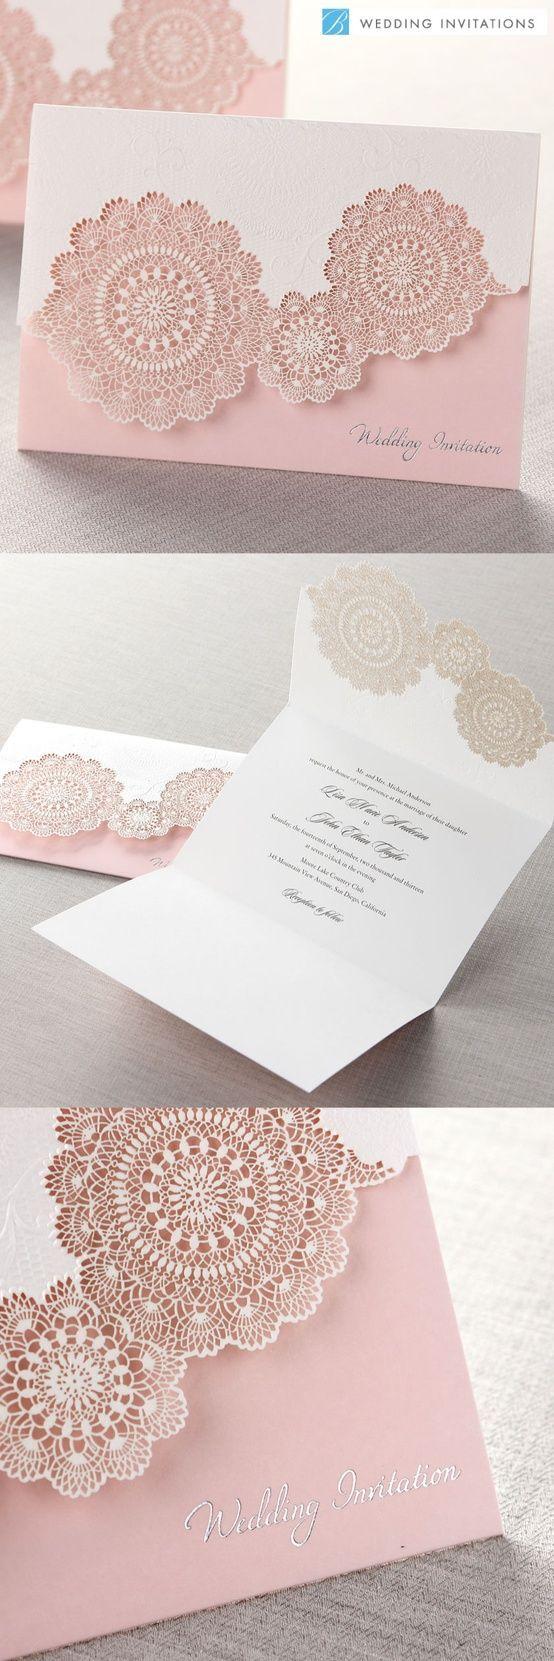 book wedding invitations uk%0A TriFold Laser Cut Pink by B Wedding Invitations